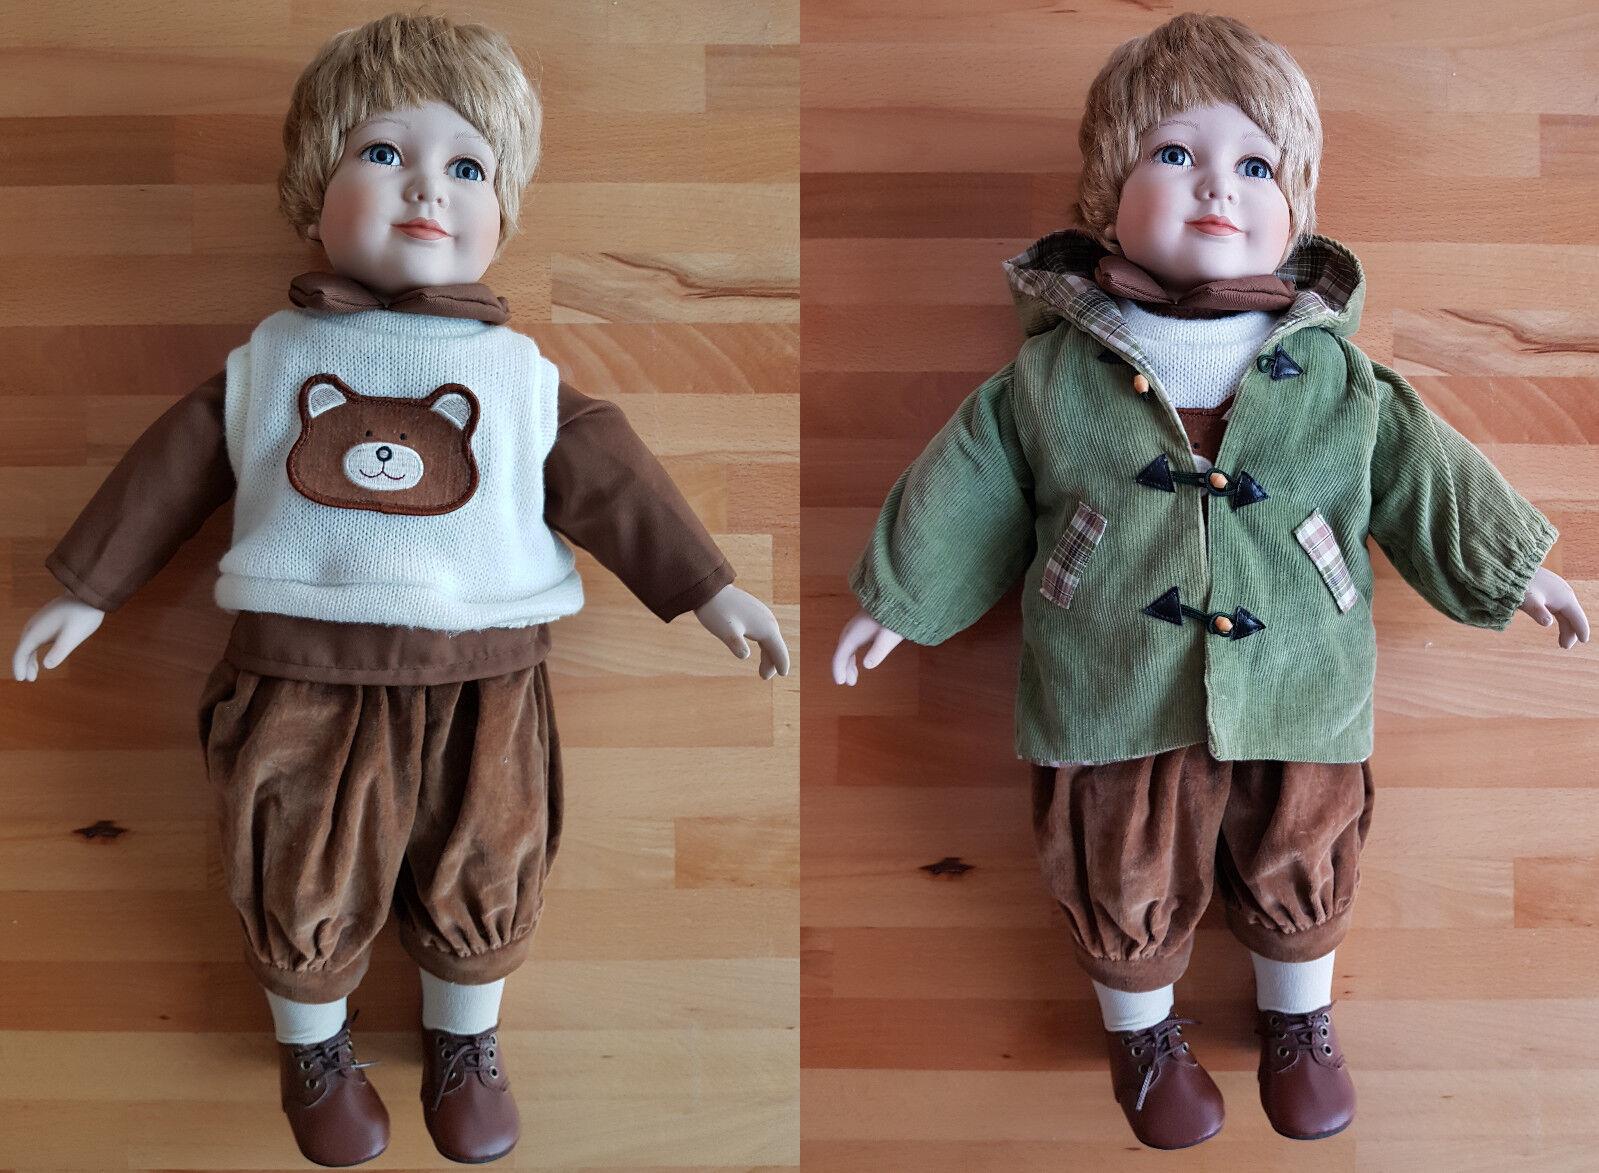 55 cm Porzellan Puppe Püppchen Figur Doll Zasan EN-1994 Limited Edition 876 1000